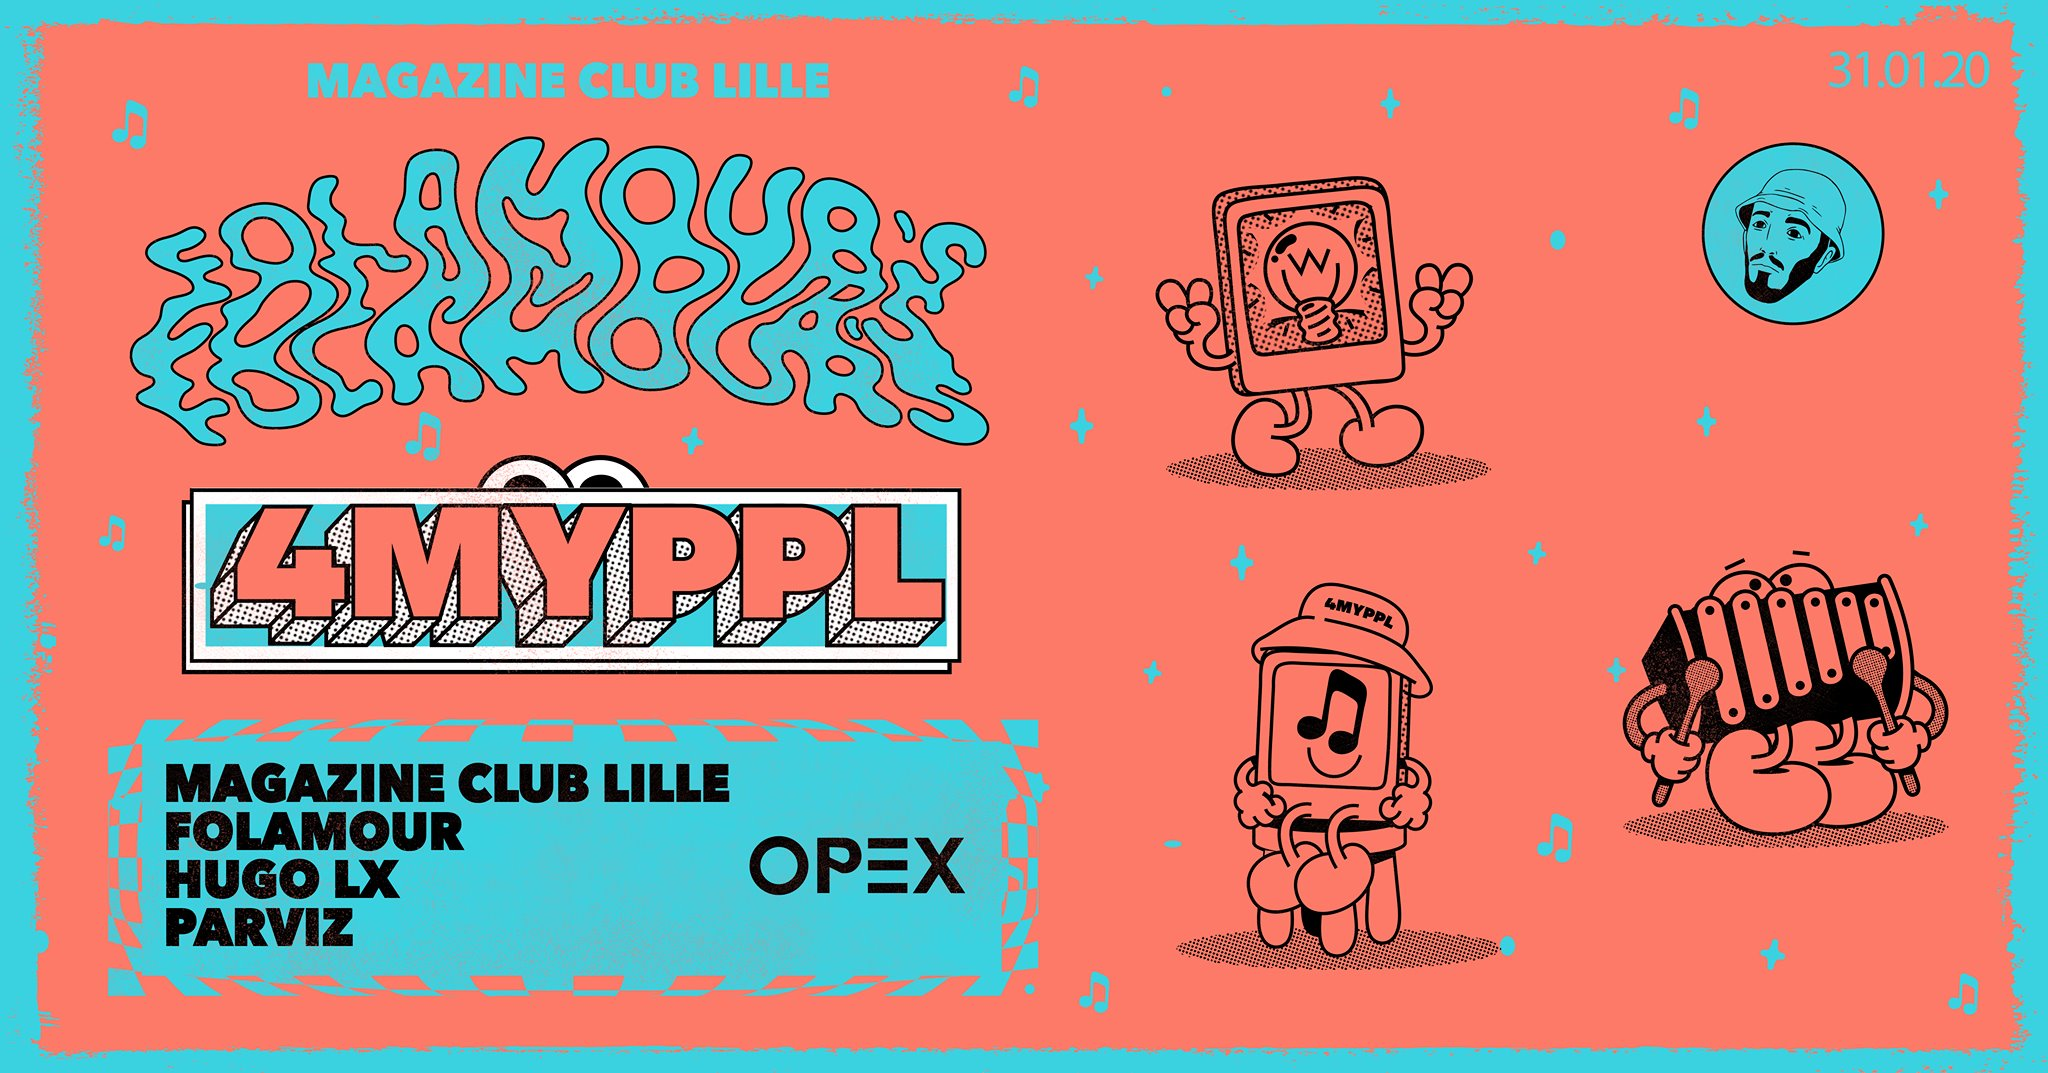 OPEX présente Folamour's 4MyPPL w/ Hugo LX & Parviz